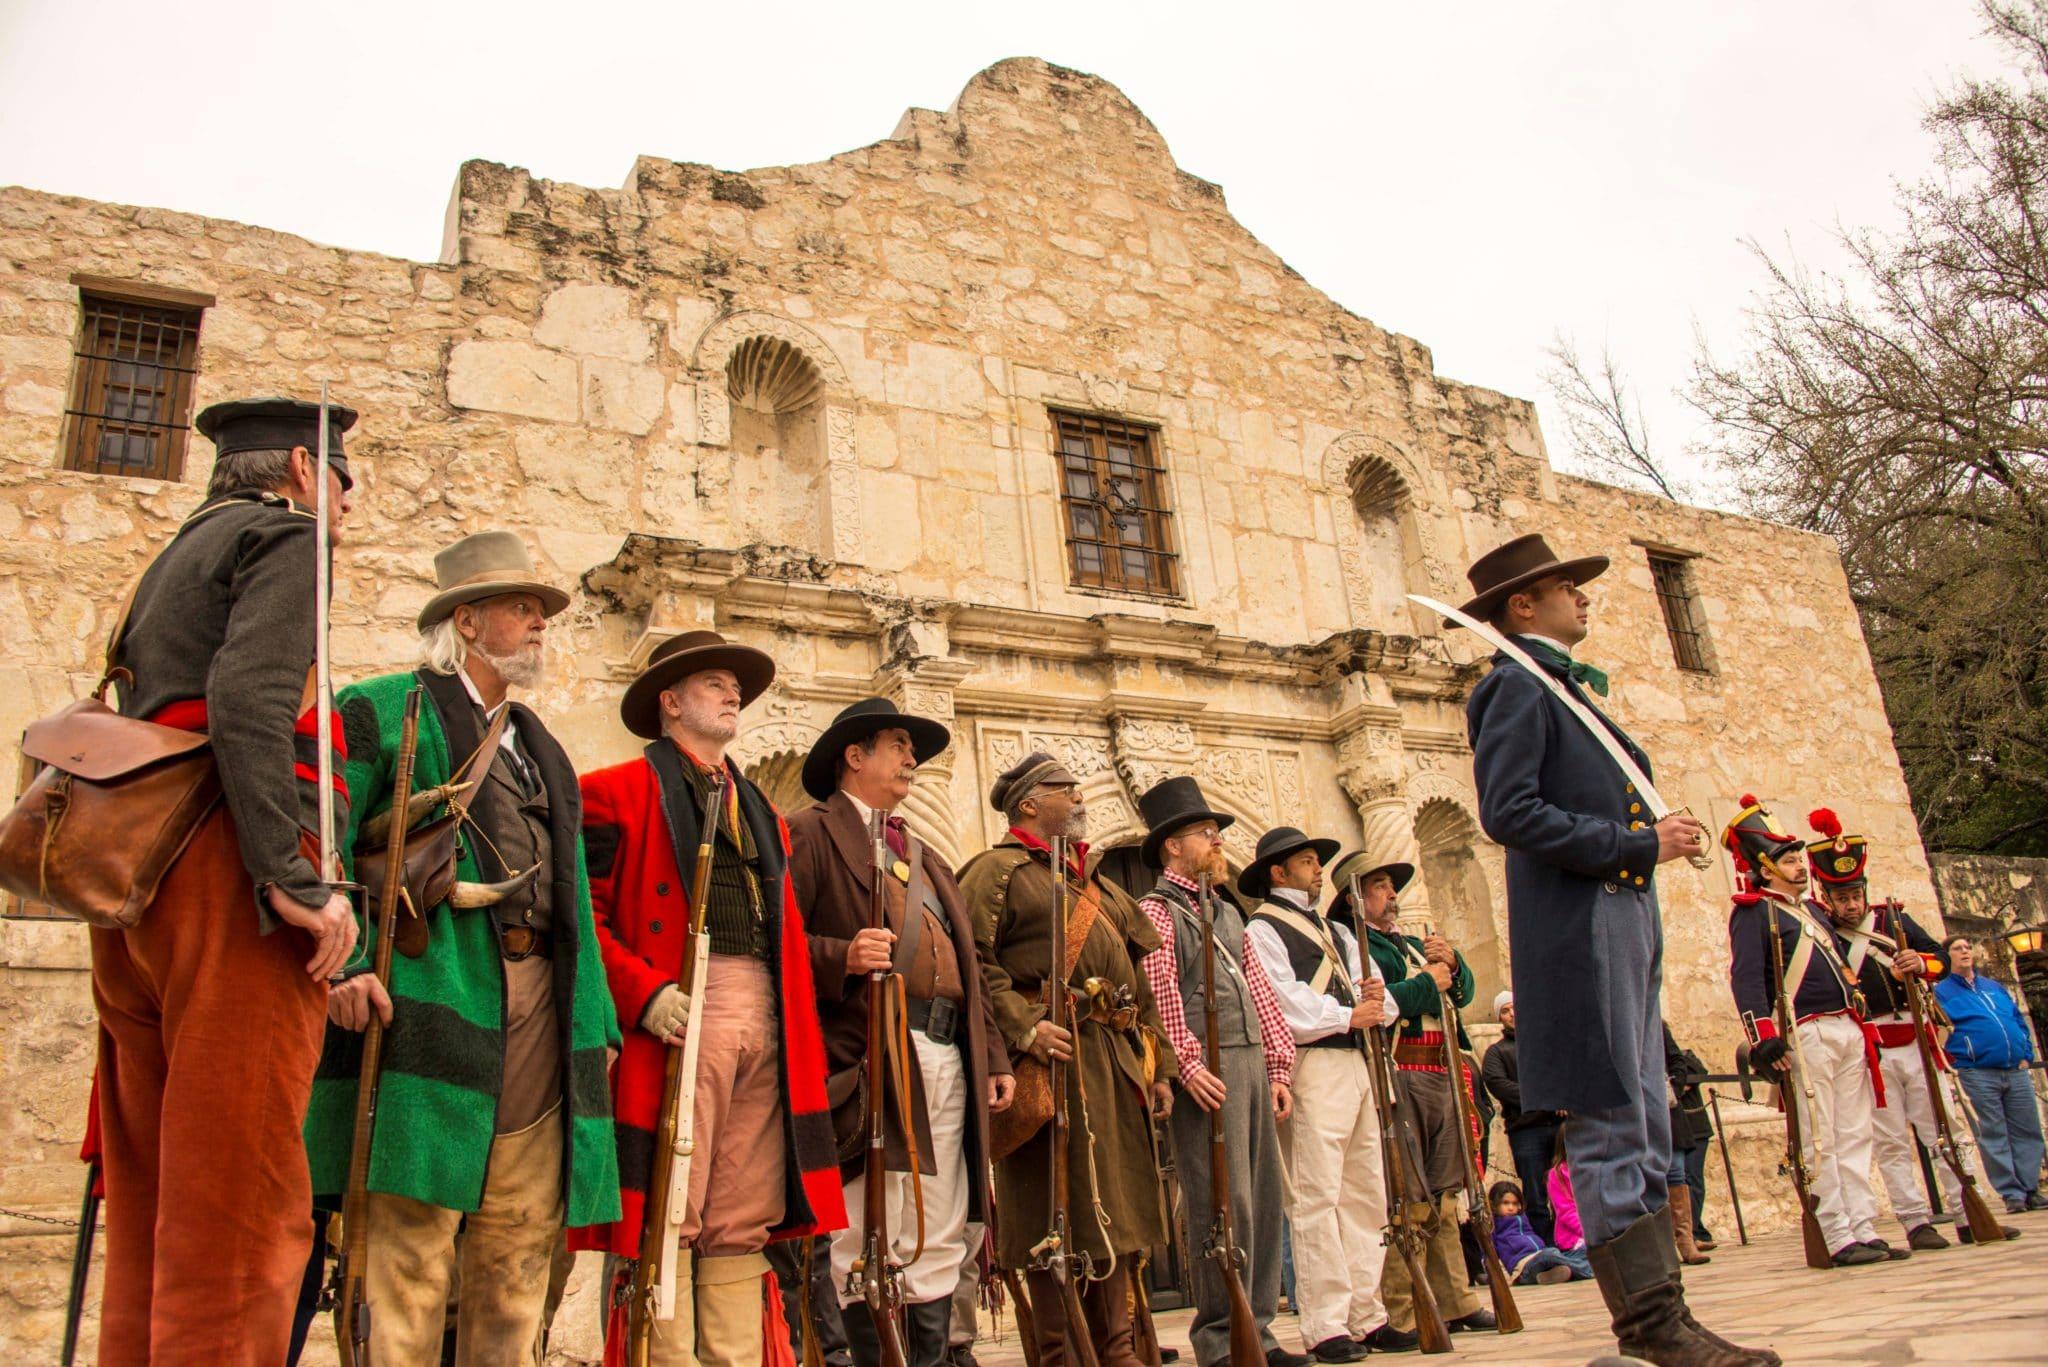 Alamo Living History courtesy of visitsanantonio.com